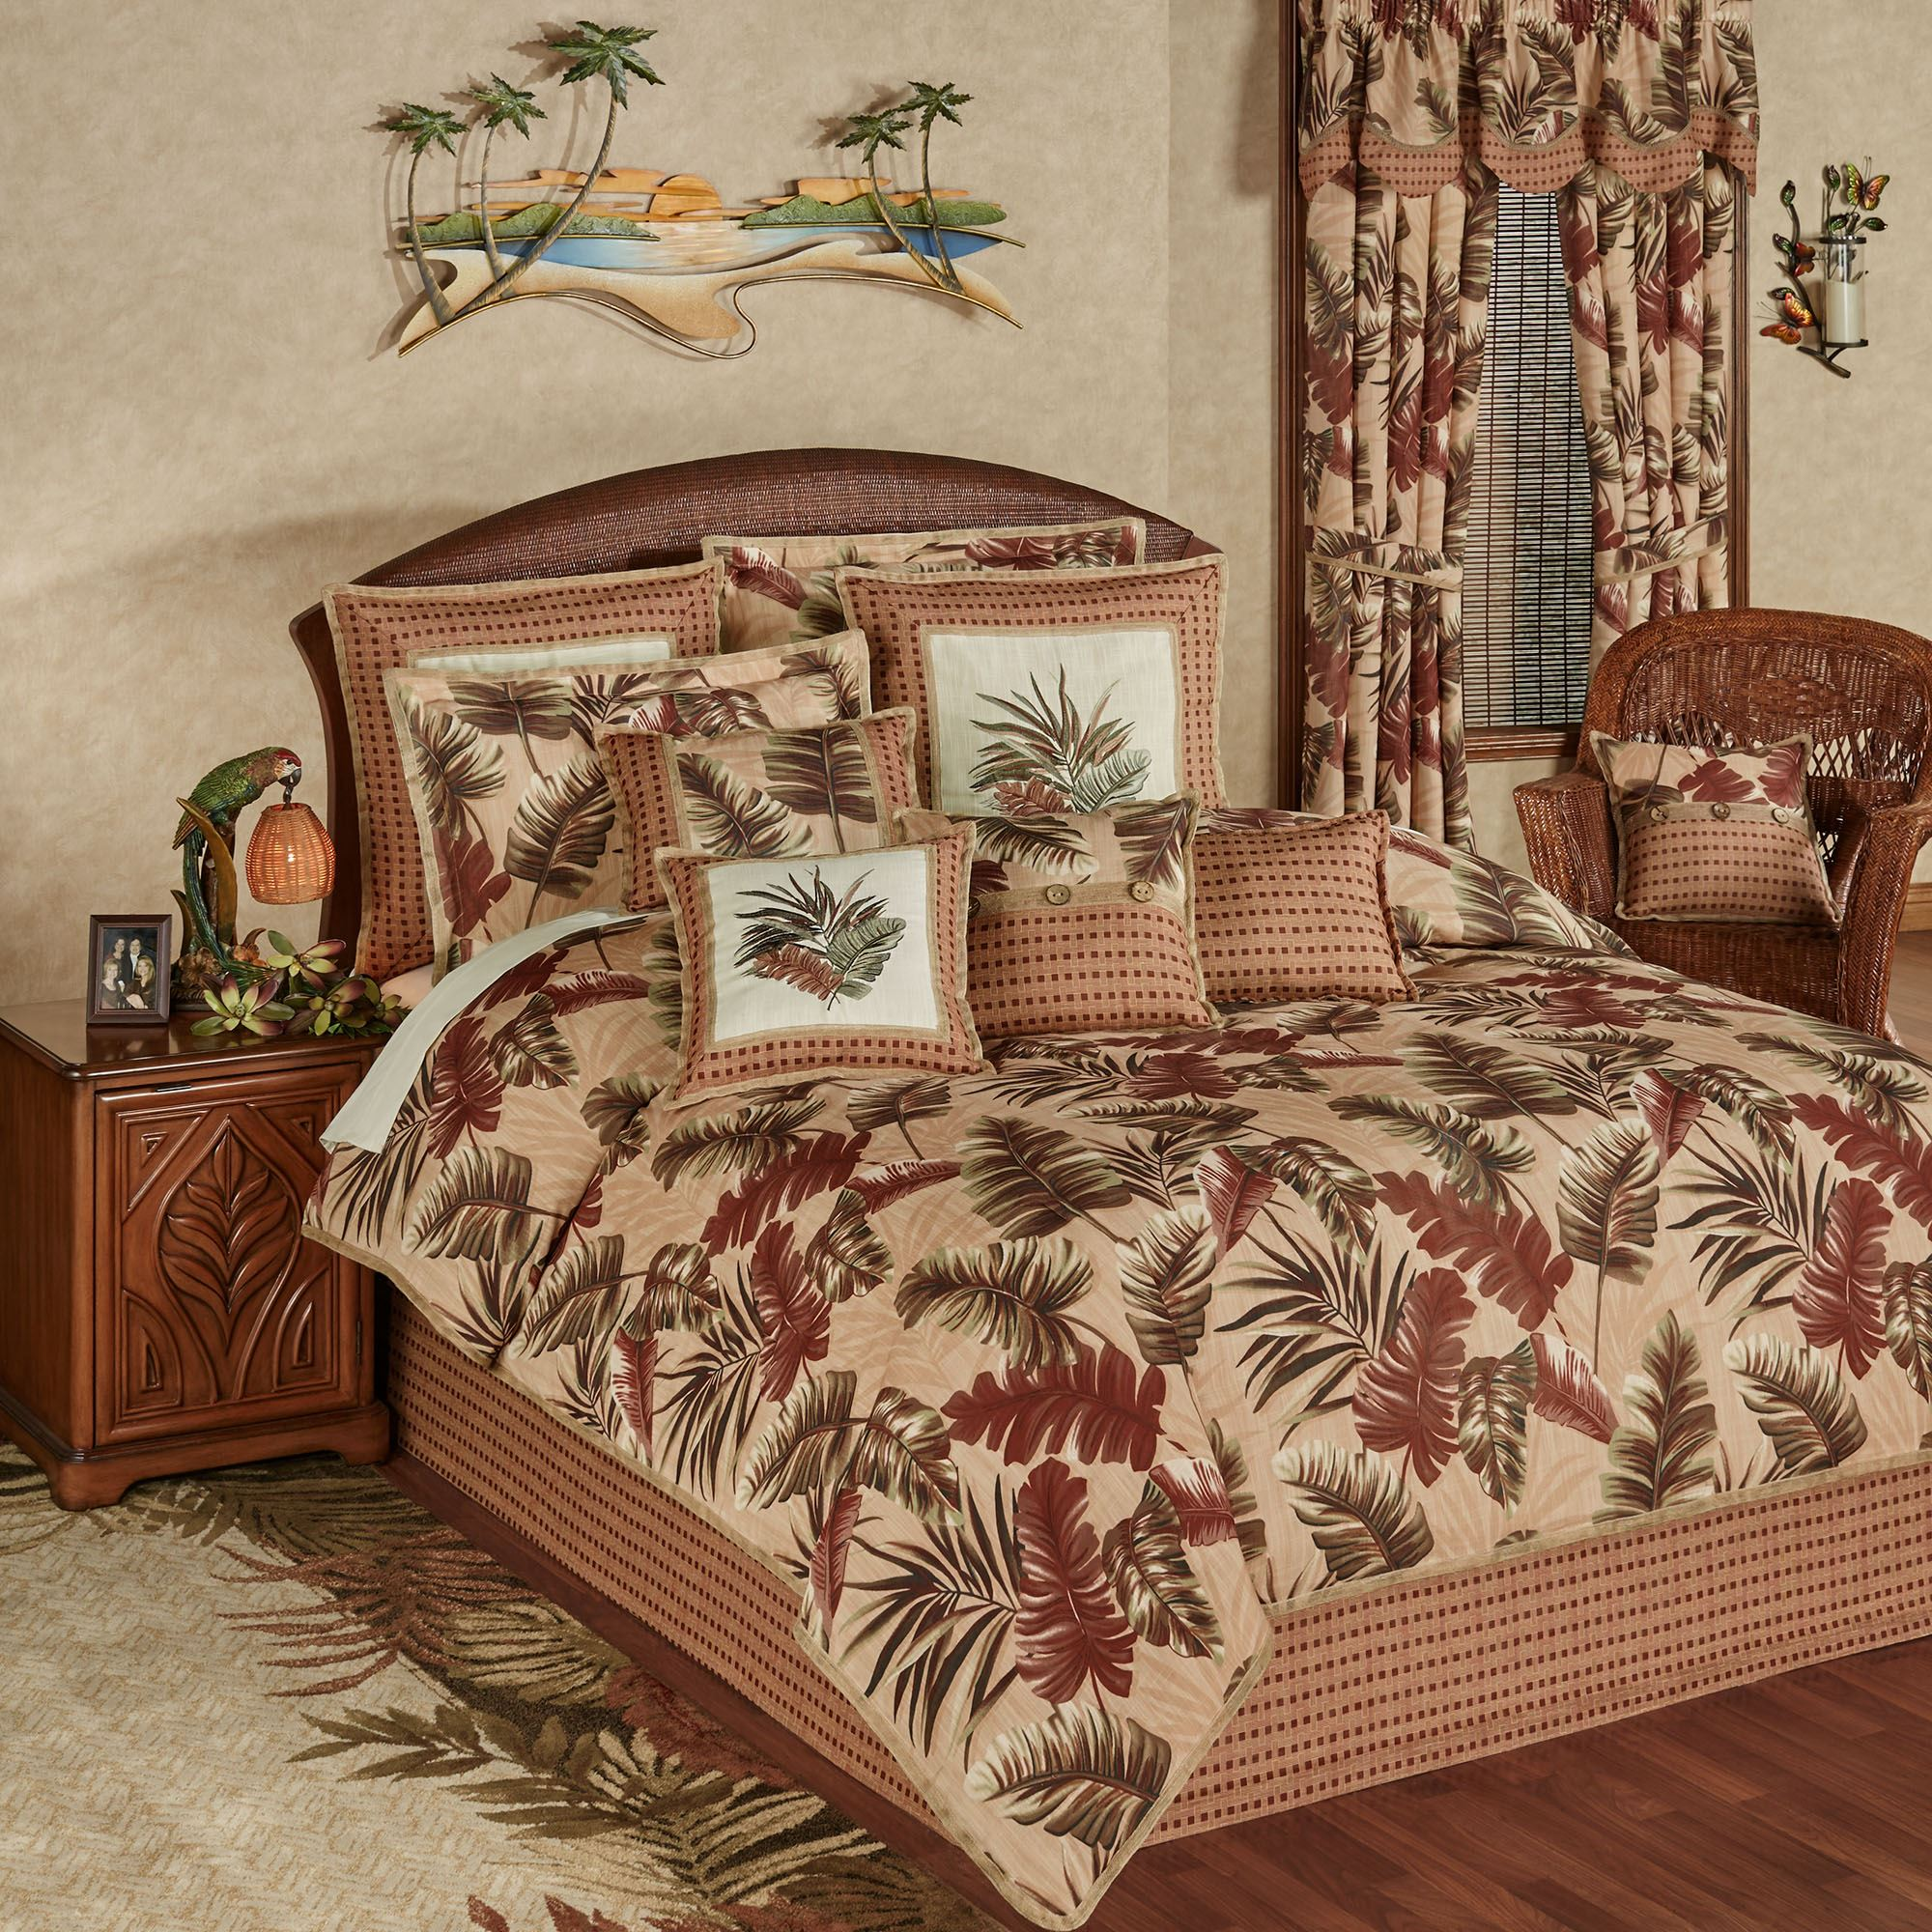 Key West Tropical Comforter Bedding